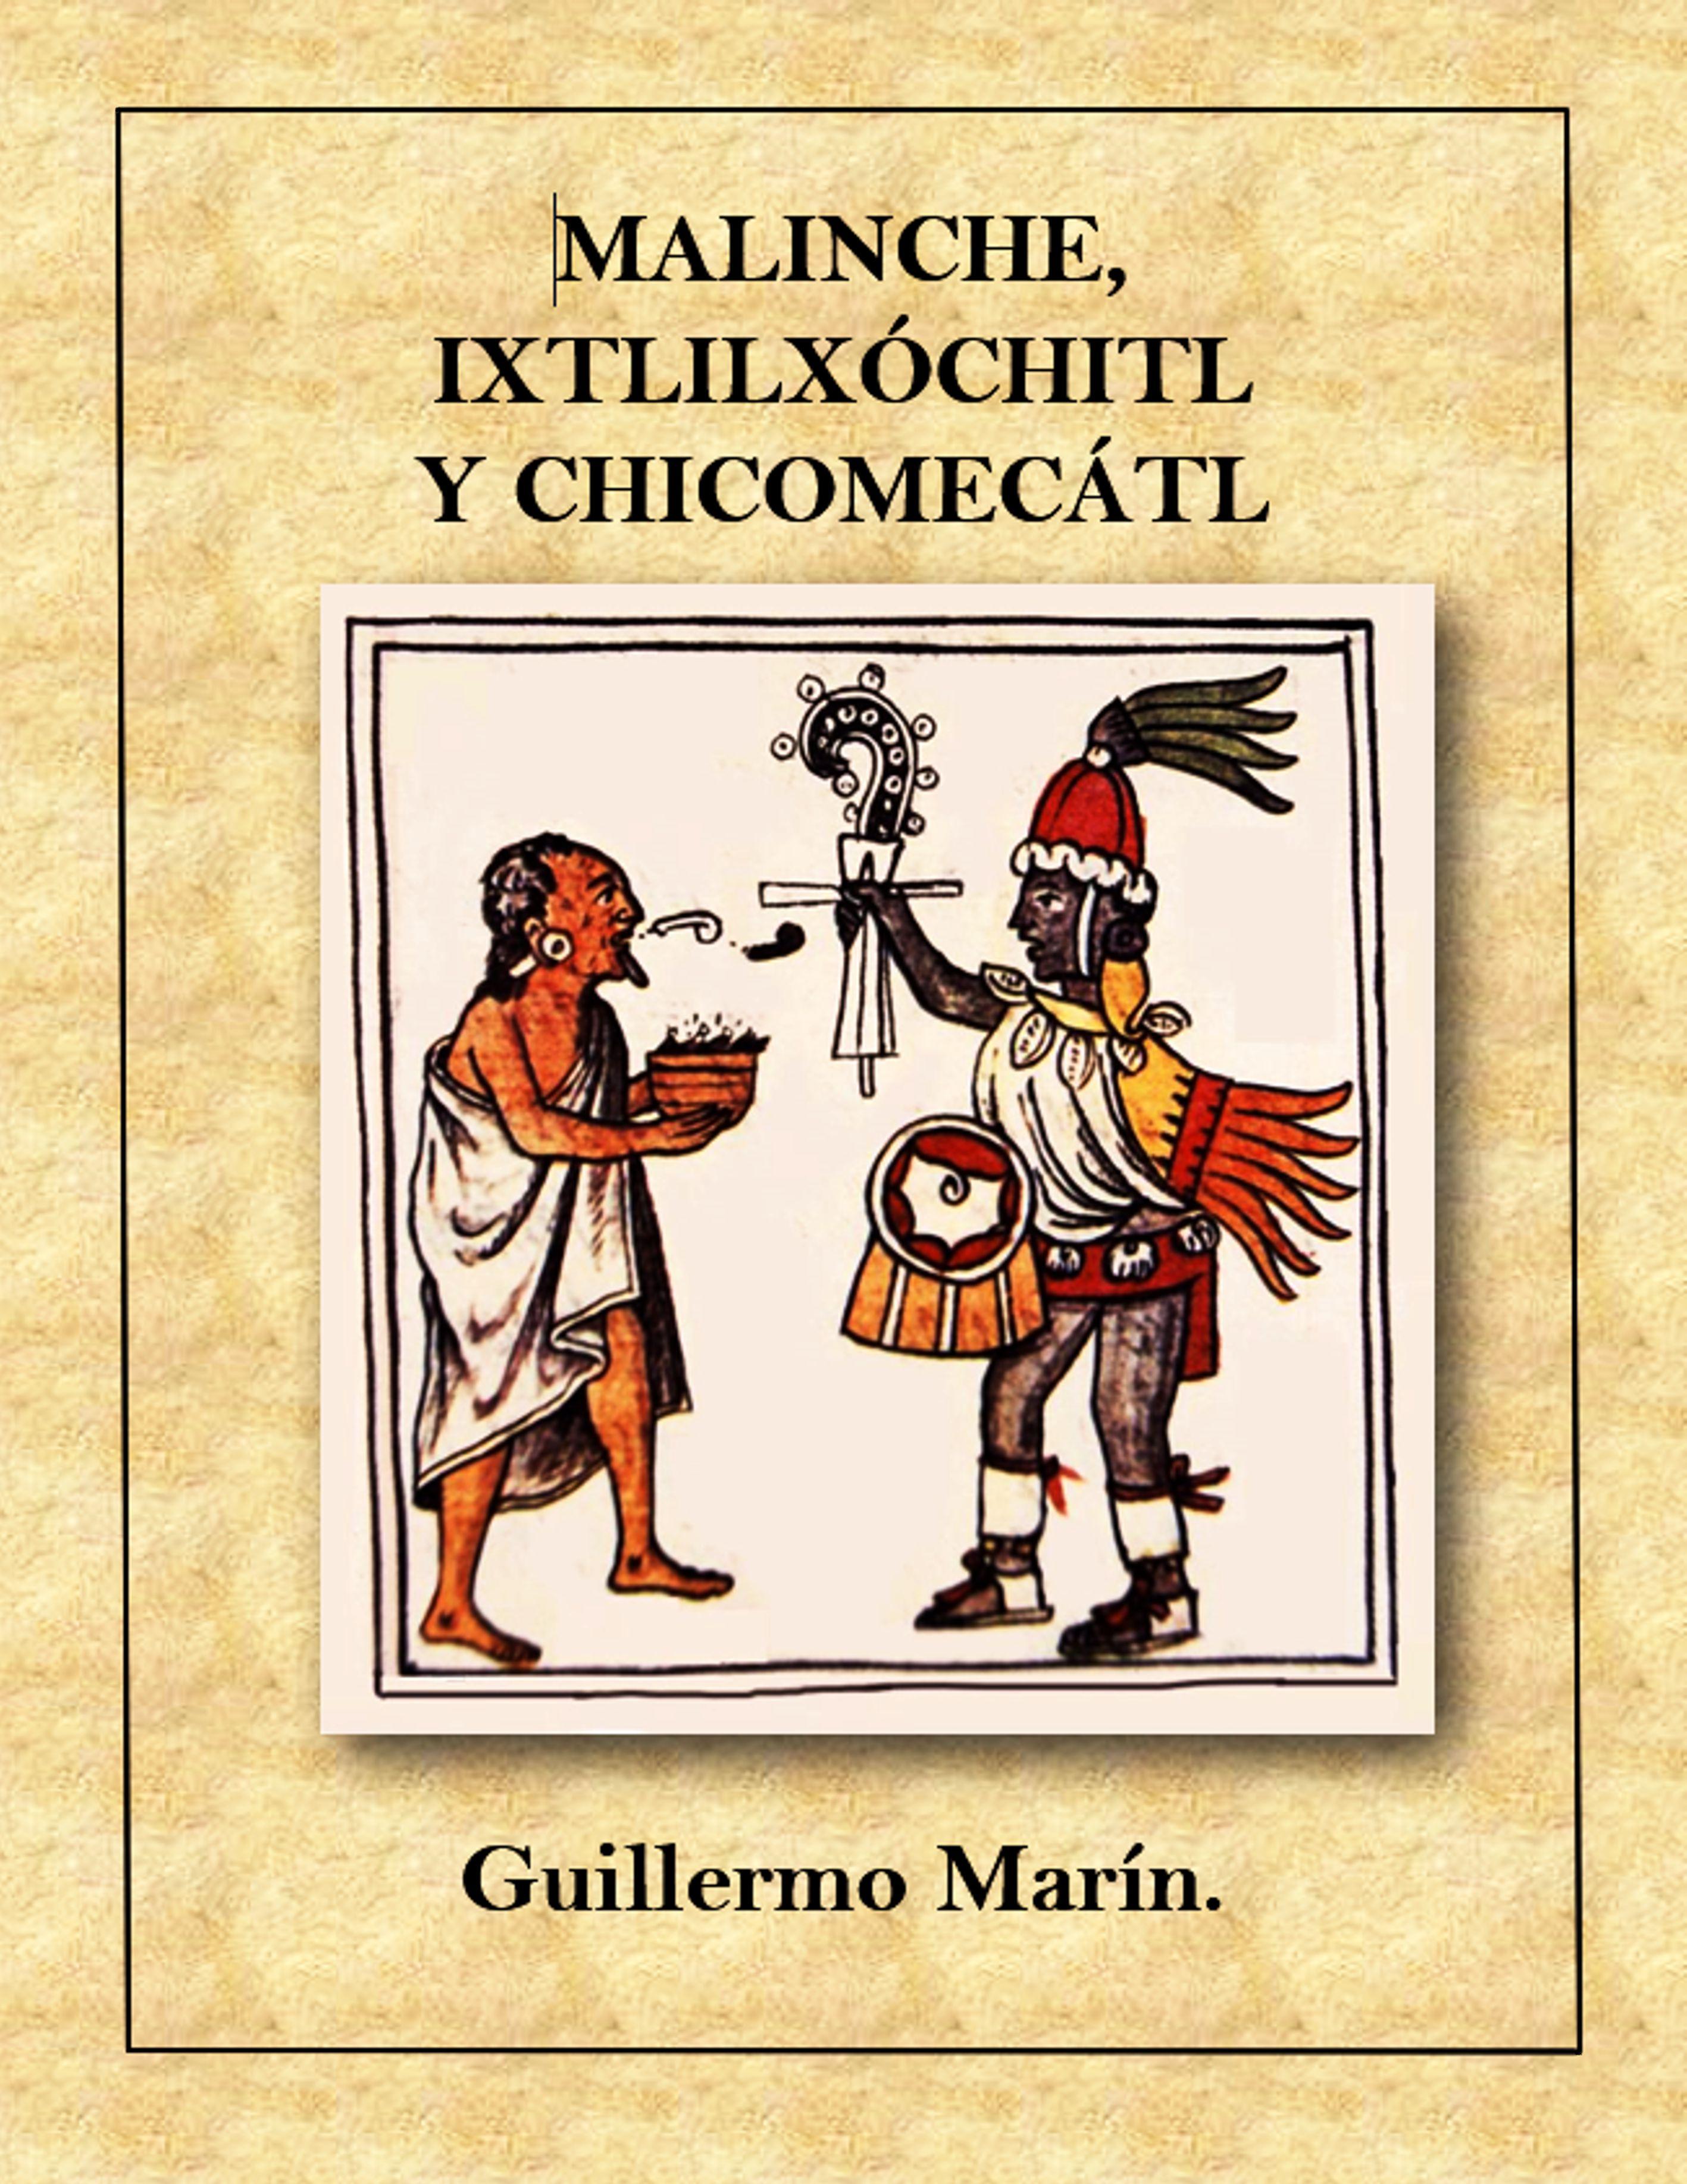 MALINCHE, IXTLILXÓCHITL Y CHICOMECÓTL